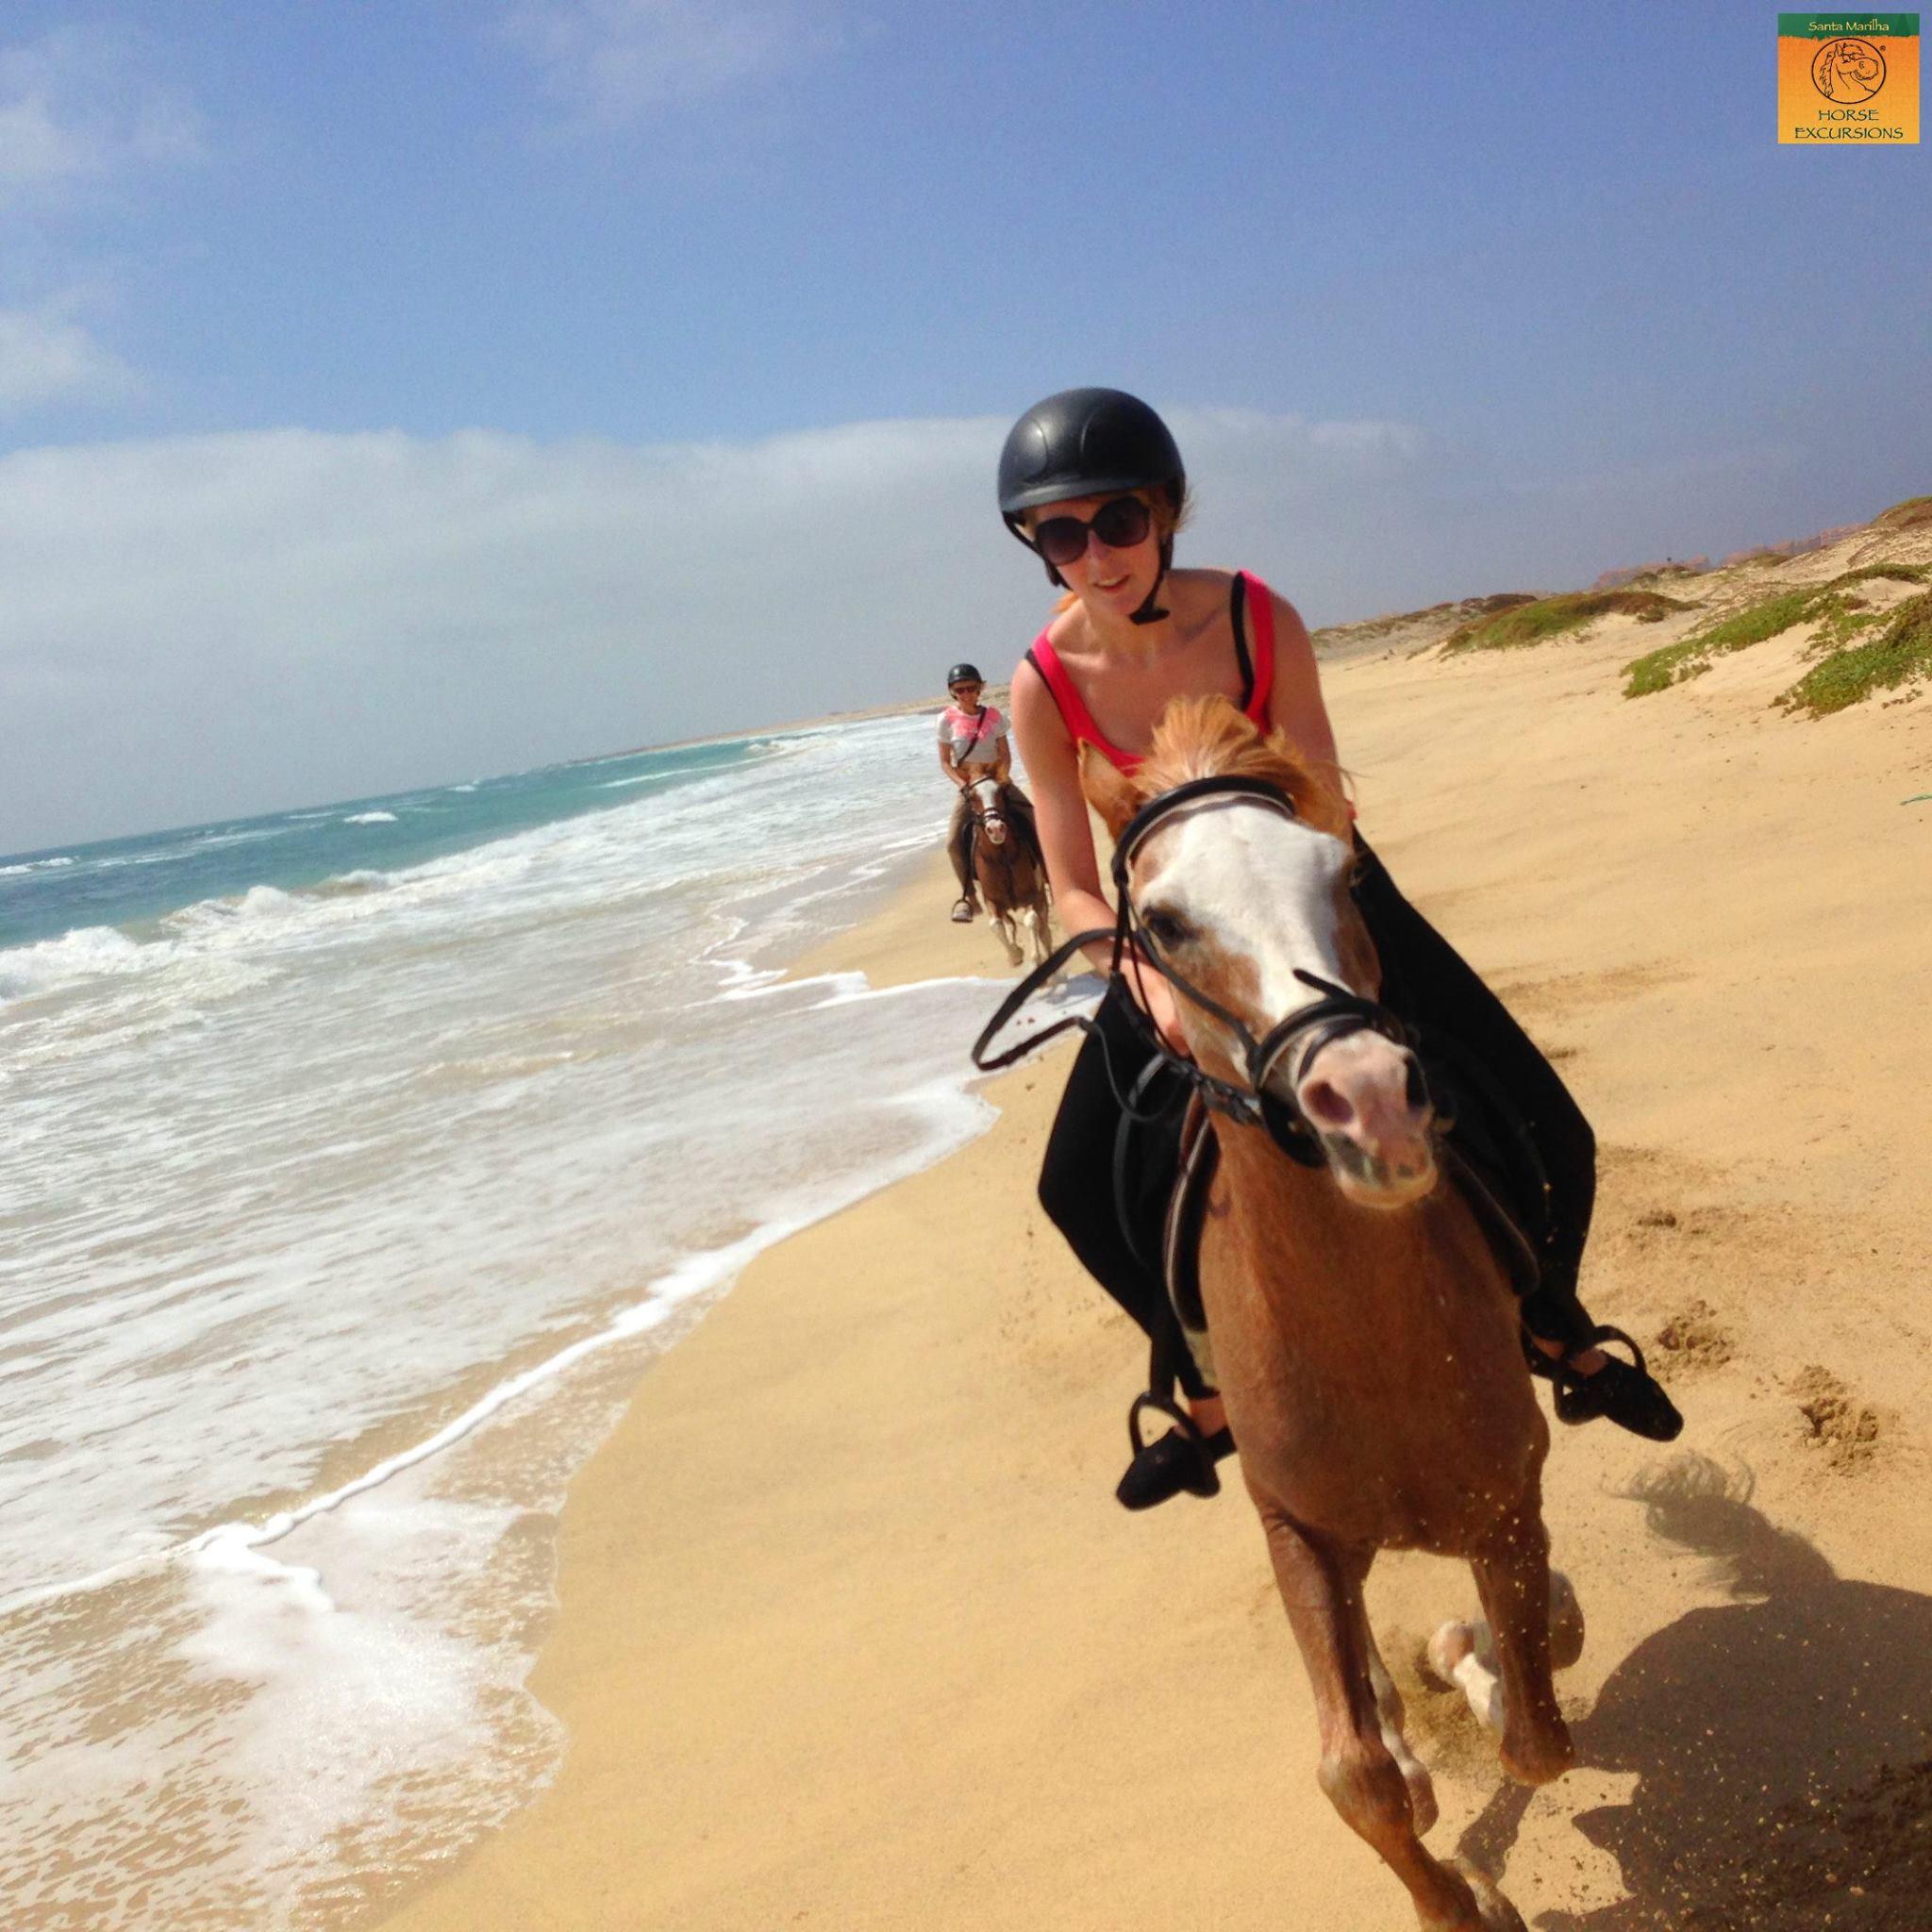 Riding at Kite Beach